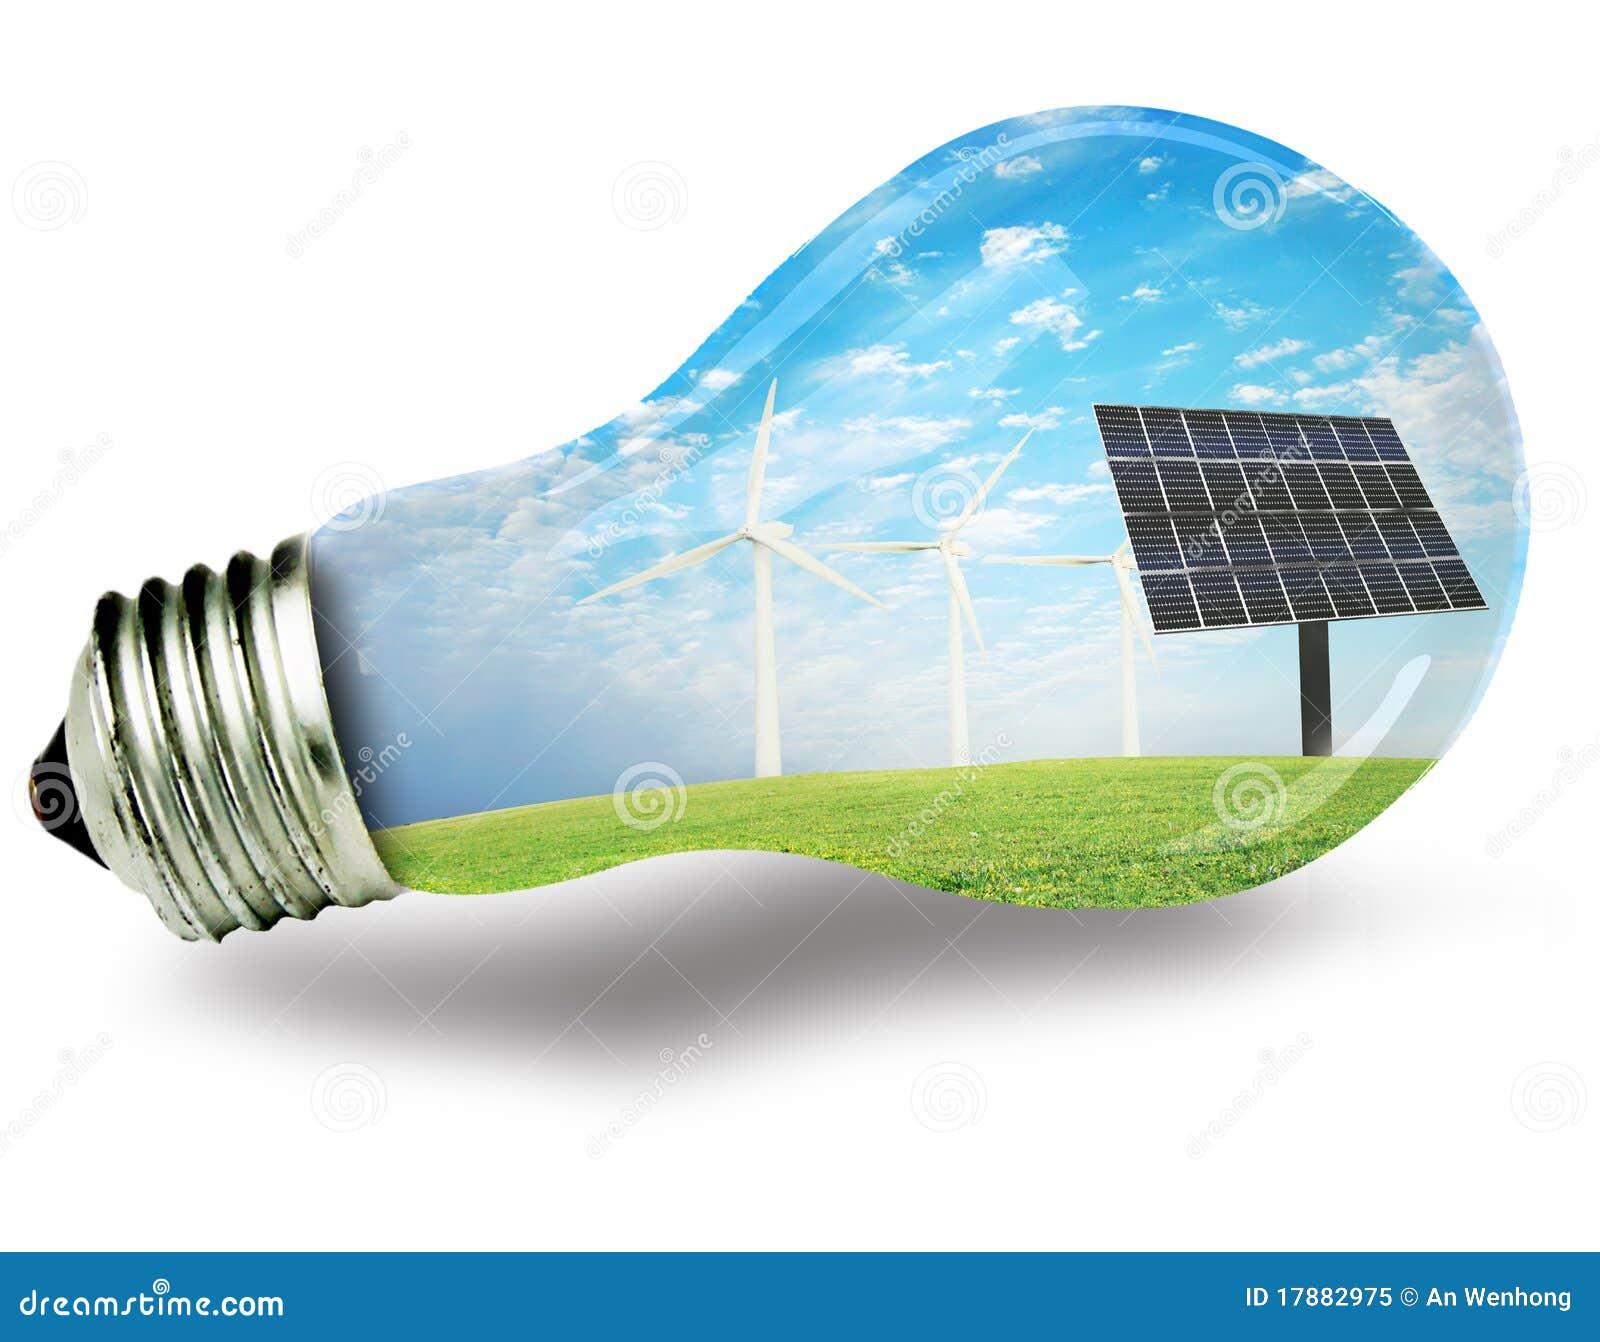 New Energy Royalty Free Stock Photo - Image: 17882975